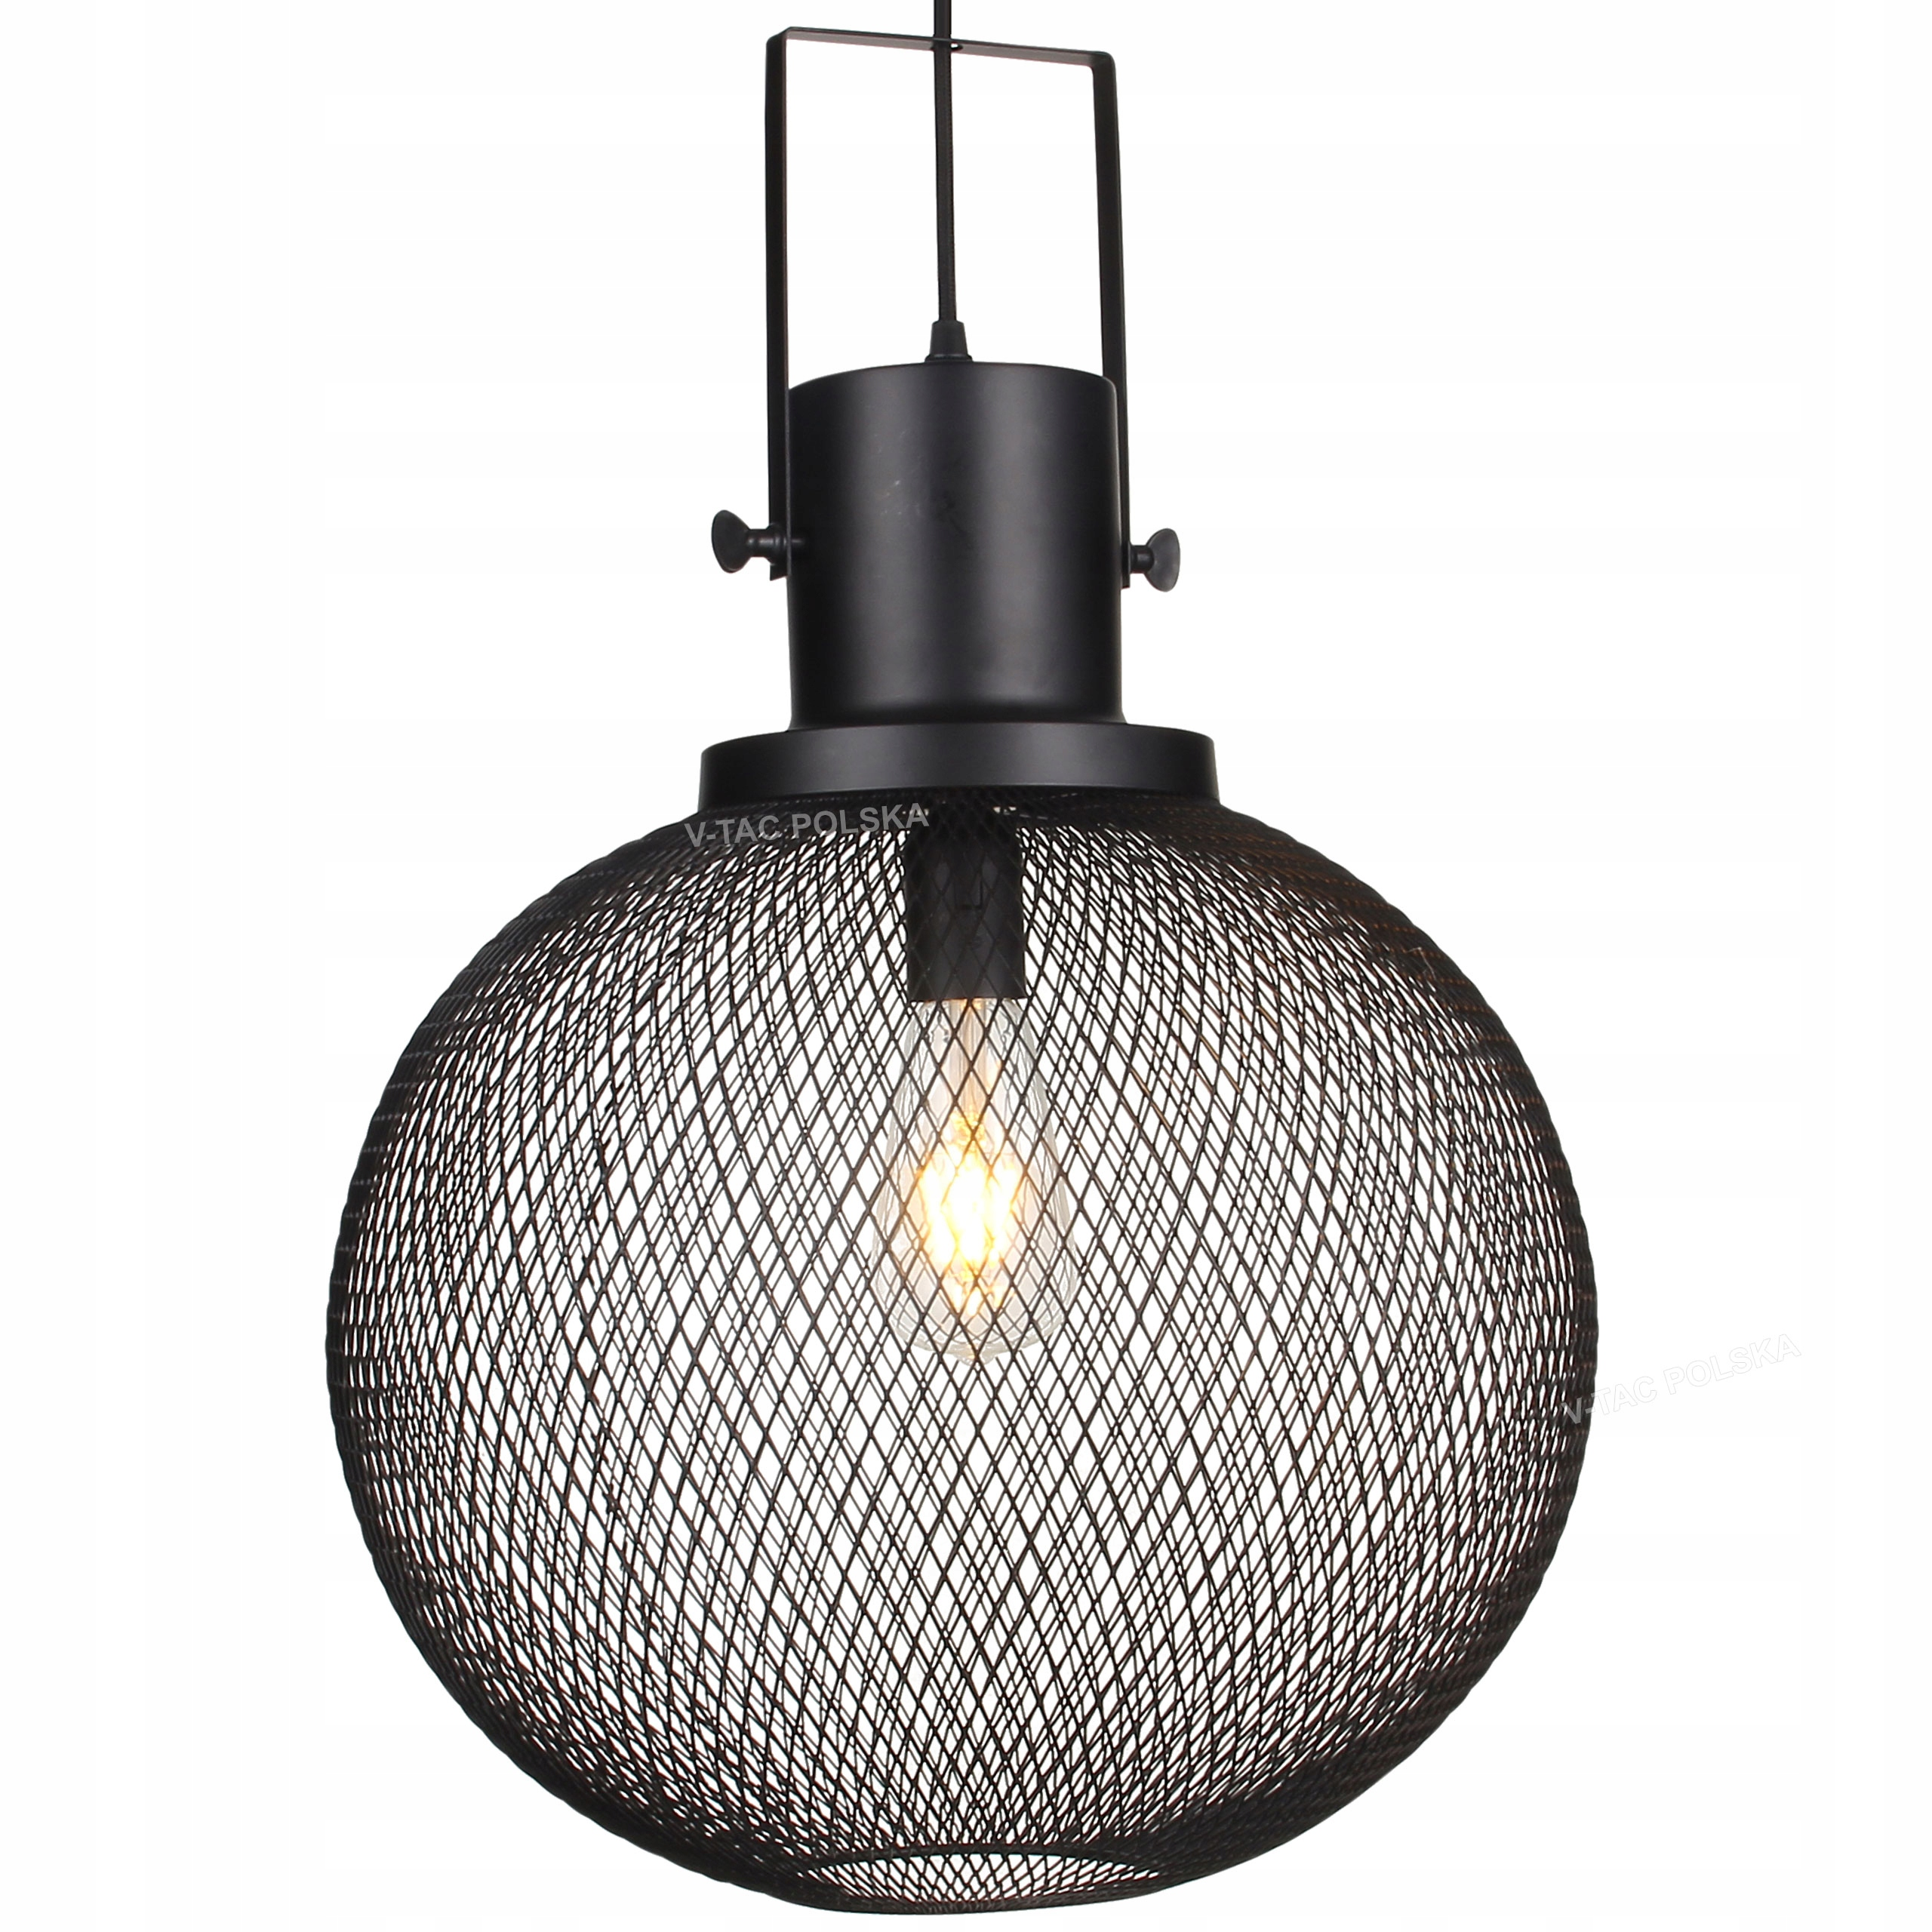 LAMPA wisząca sufitowa LOFT BAR High Bay żyrandol